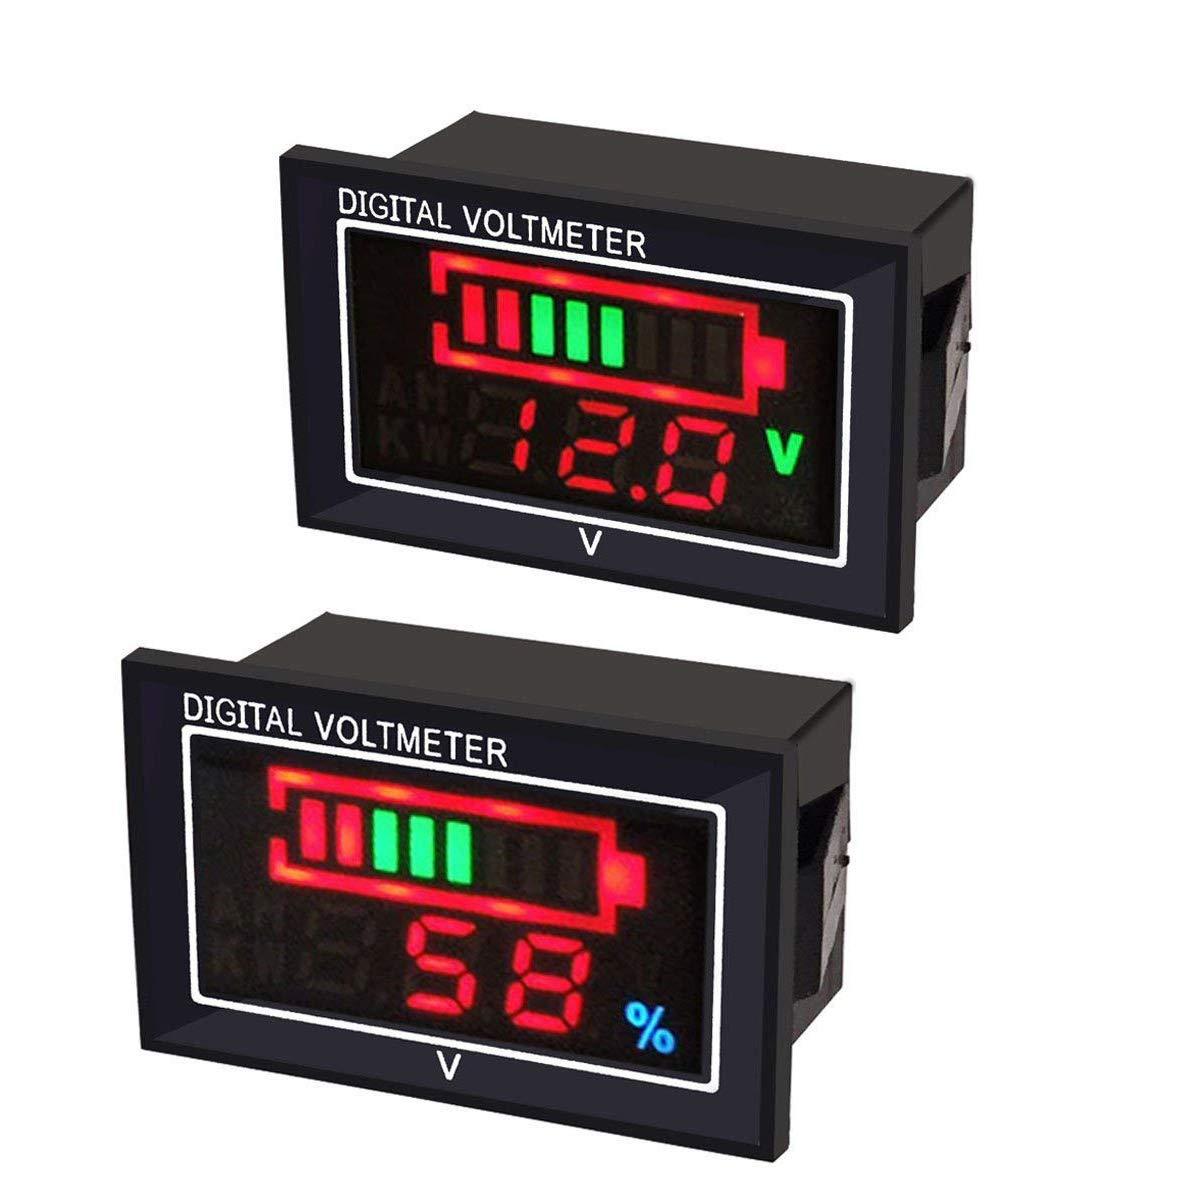 Innovateking-EU 2ST Digital Voltmeter/Amperemeter LED Anzeige Sä ure Batteriekapazitä t Anzeige Multimeter, DC6-80V Wasserdichte Spannung entladene Monitor Tester,0,56 Zoll Reverse Polarity Protection